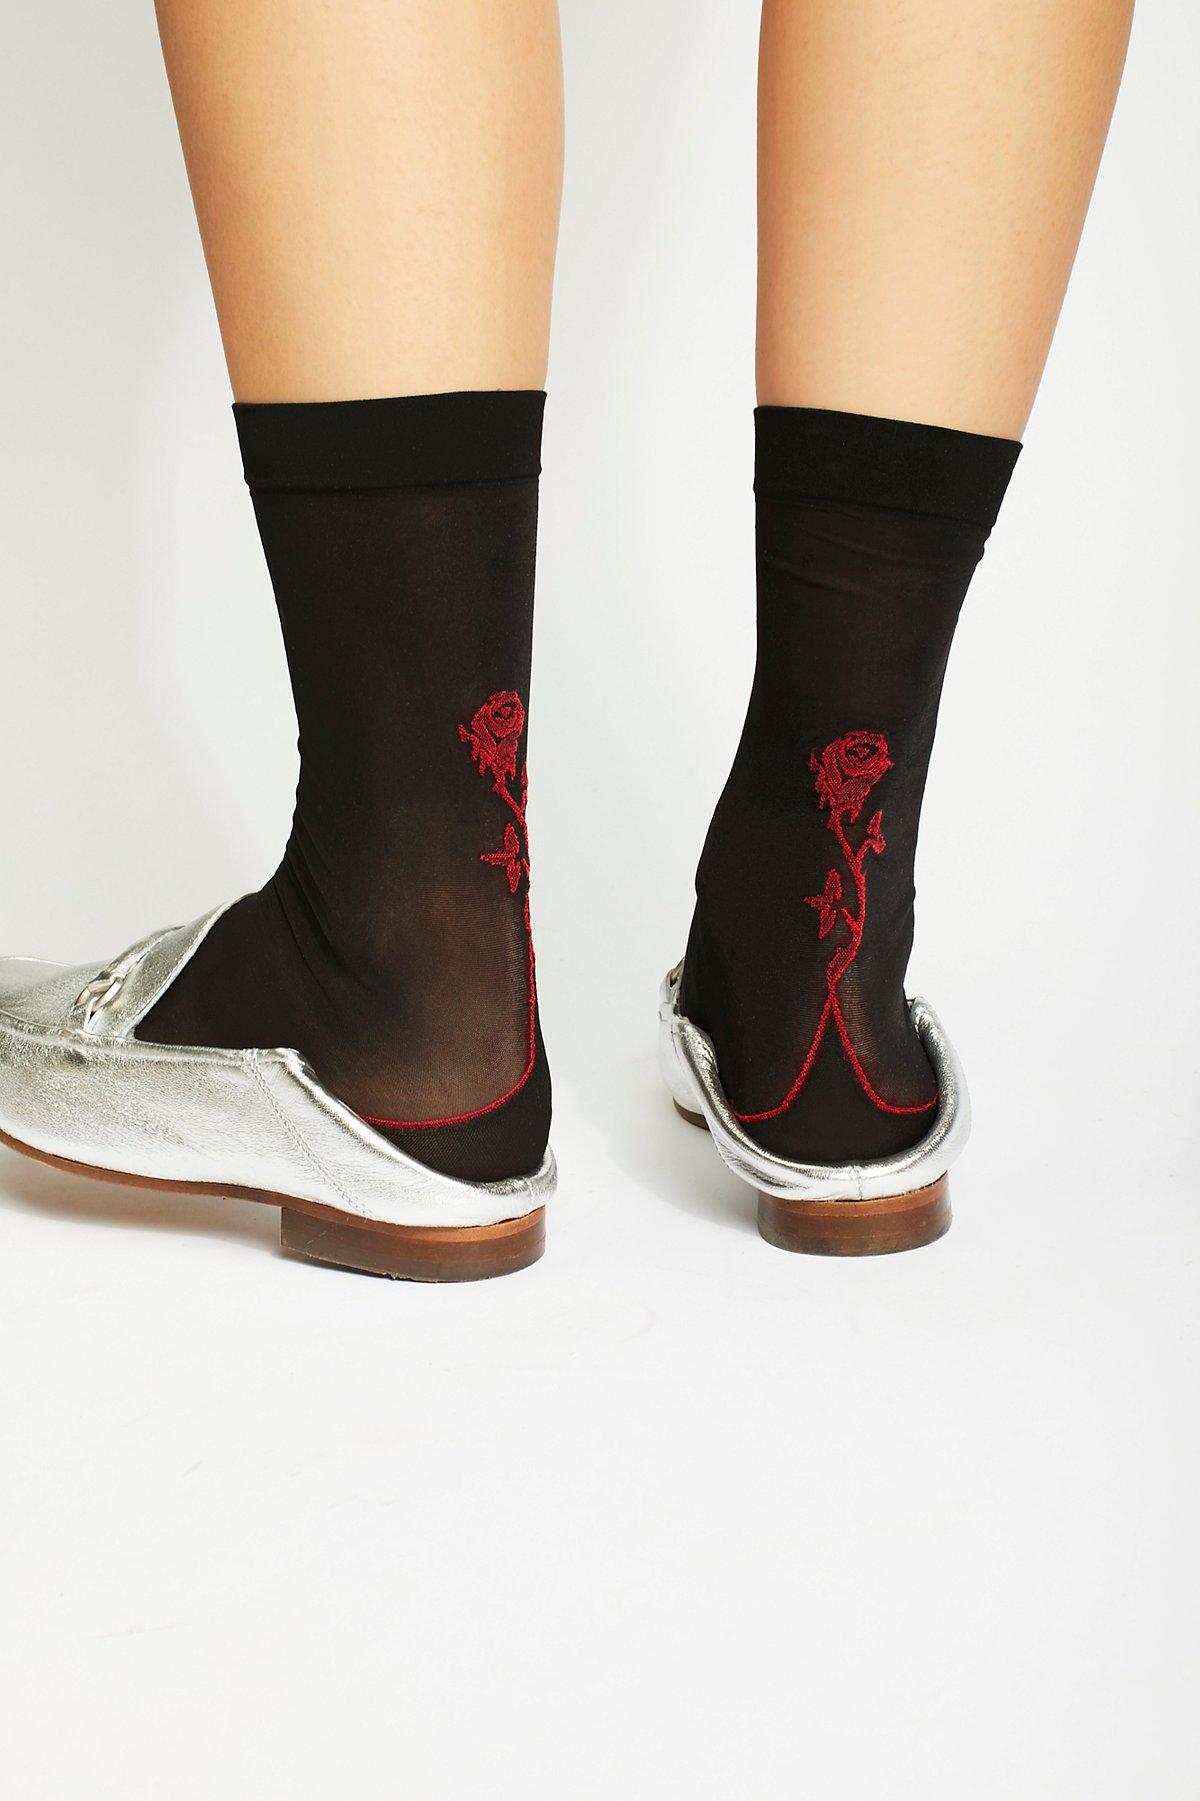 Manhattan Rose Sock